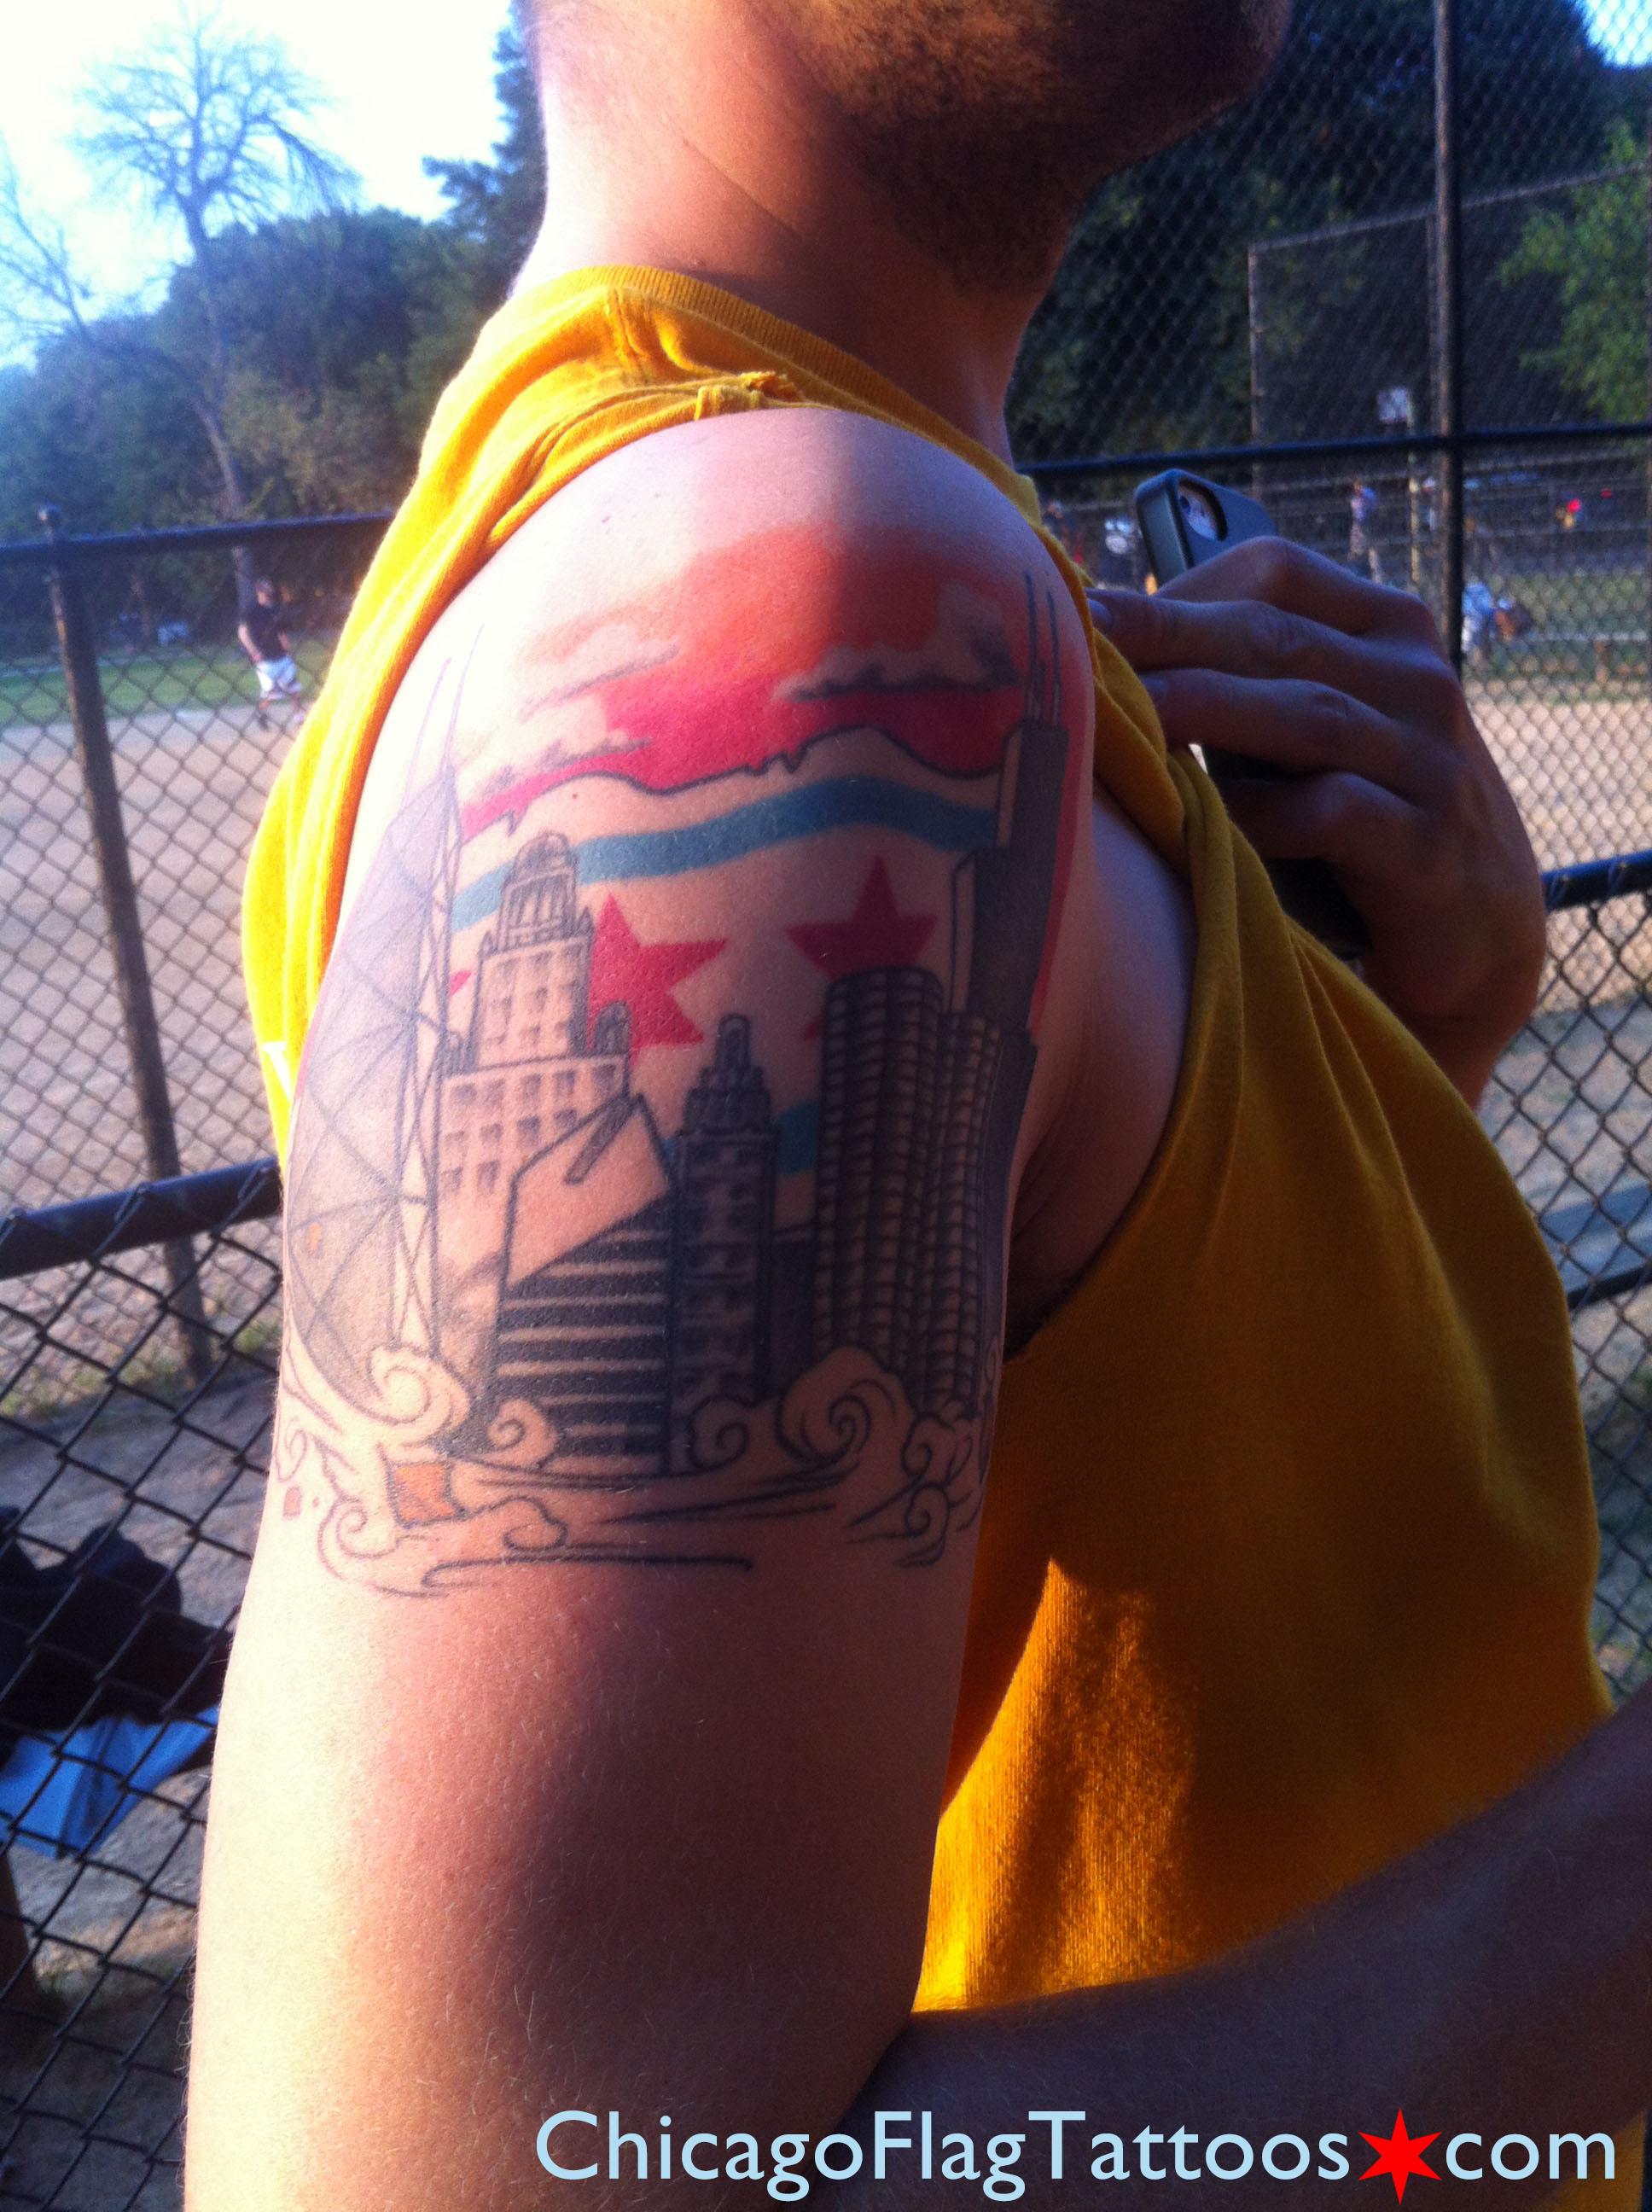 http://chicagoflagtattoos.com/img/michael-2-tattoo.jpg